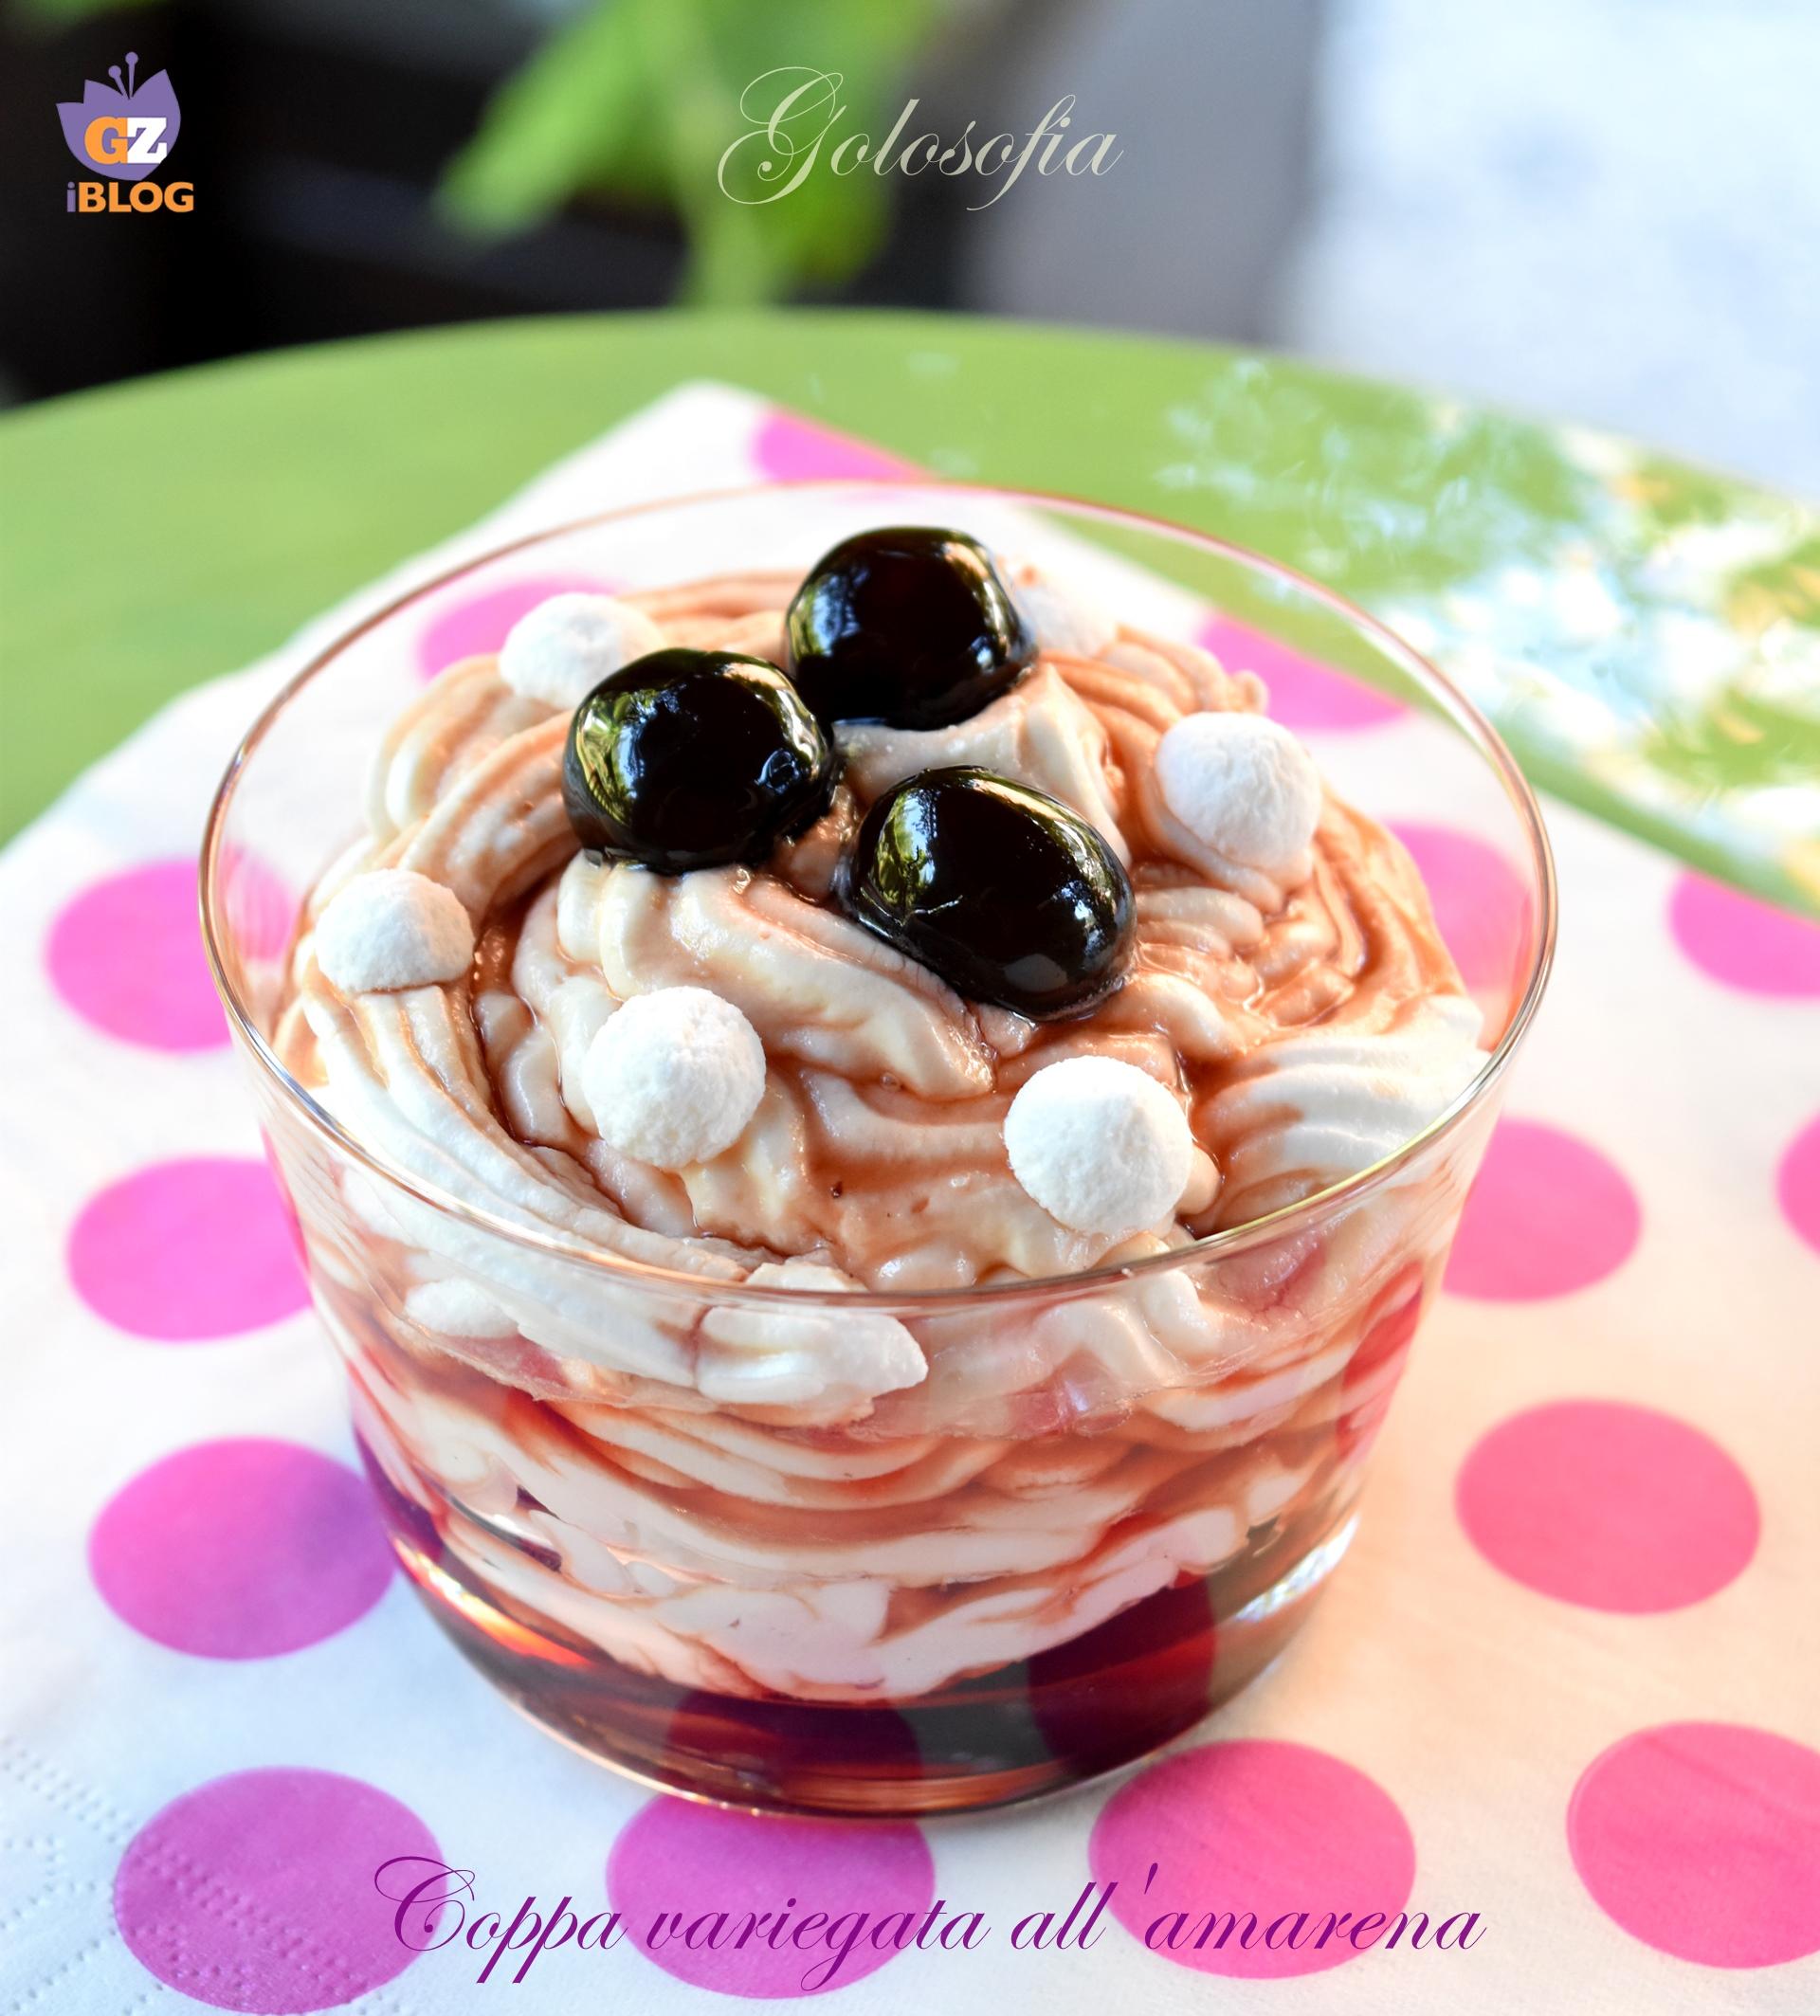 Coppa variegata all'amarena-ricetta dolci-golosofia